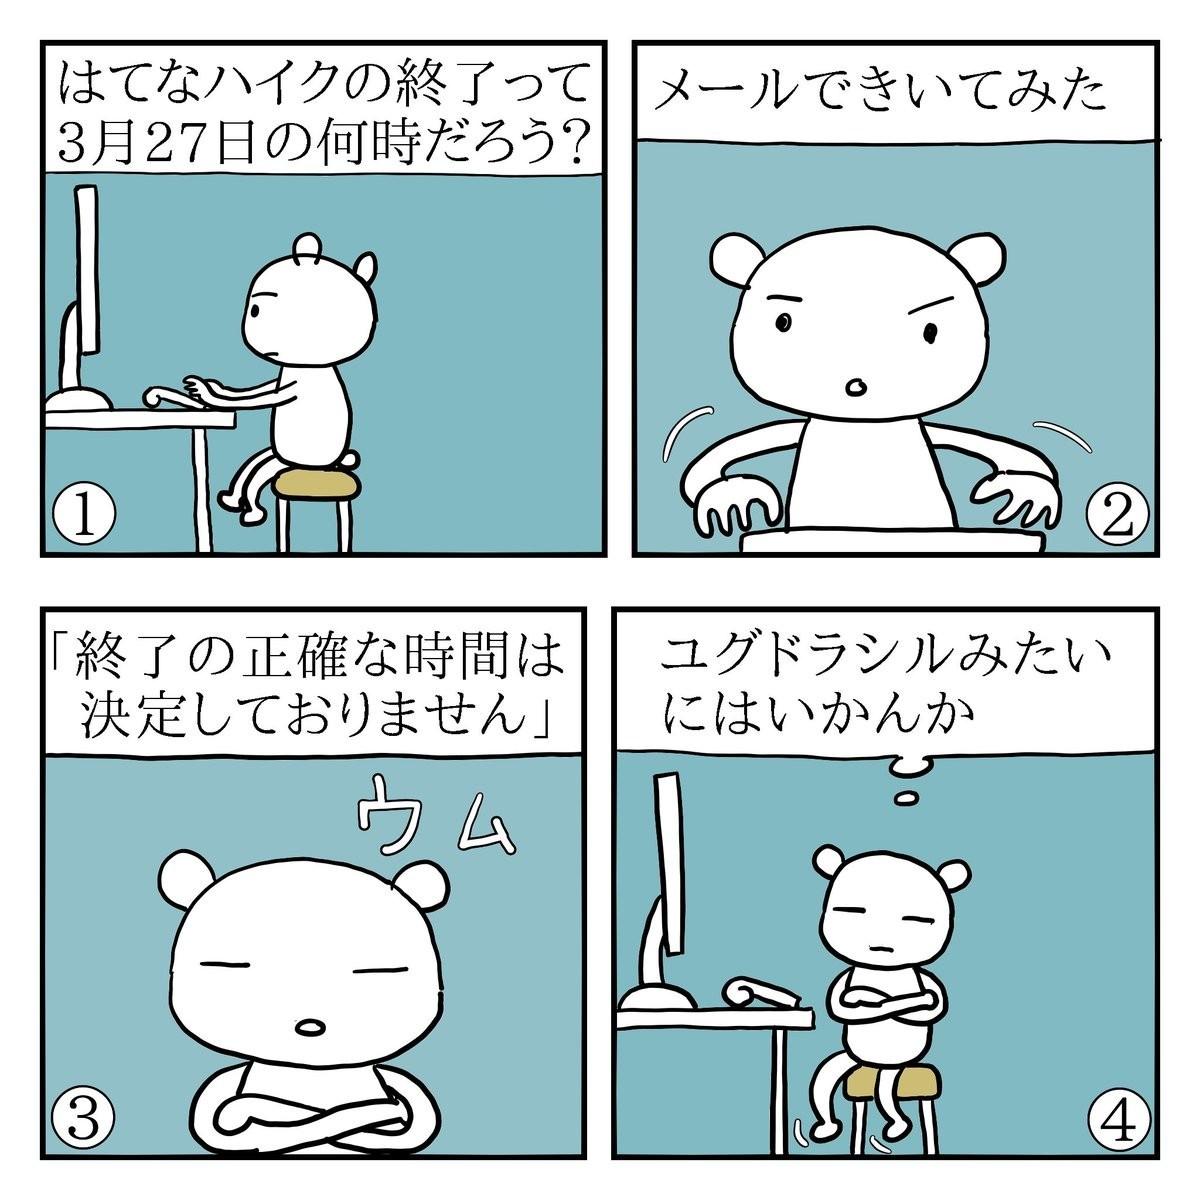 f:id:kanarihikokuma:20190319212321j:image:w330